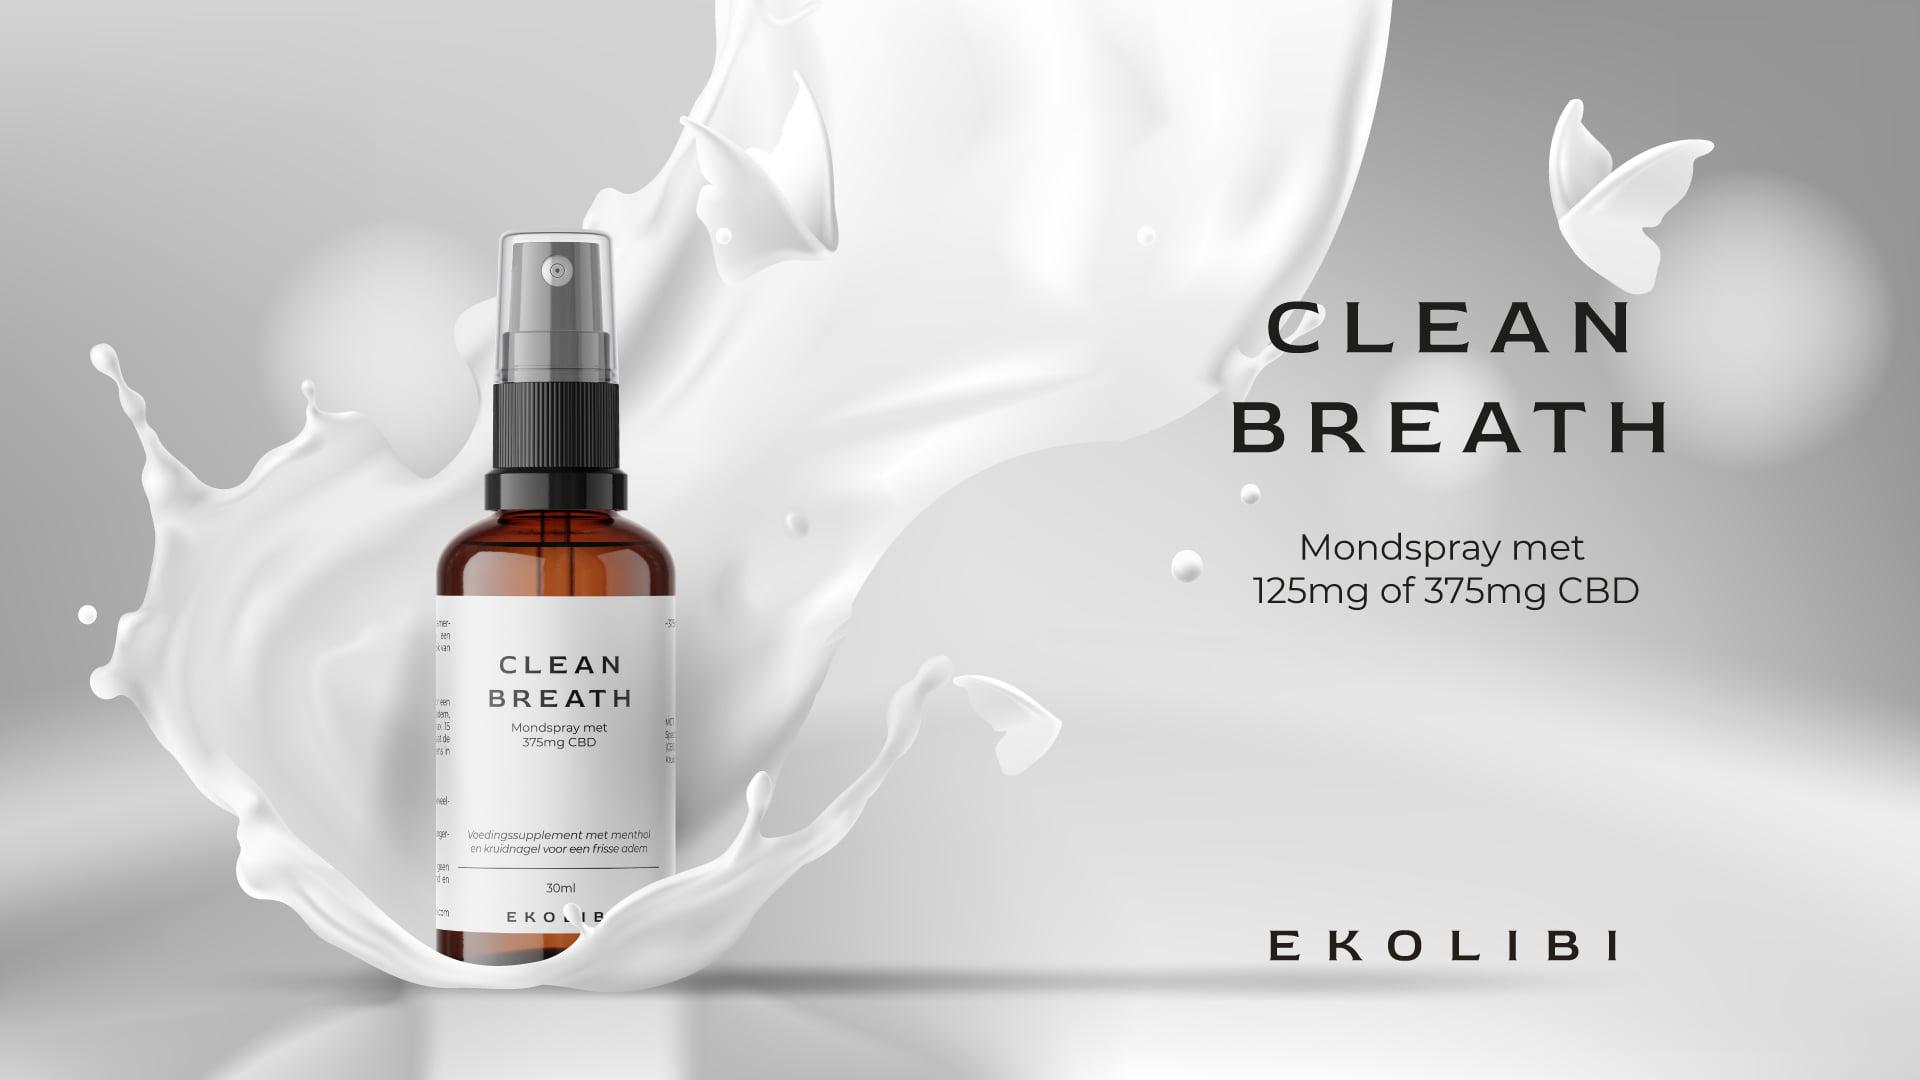 Ekolibi Clean Breath CBD productpagina